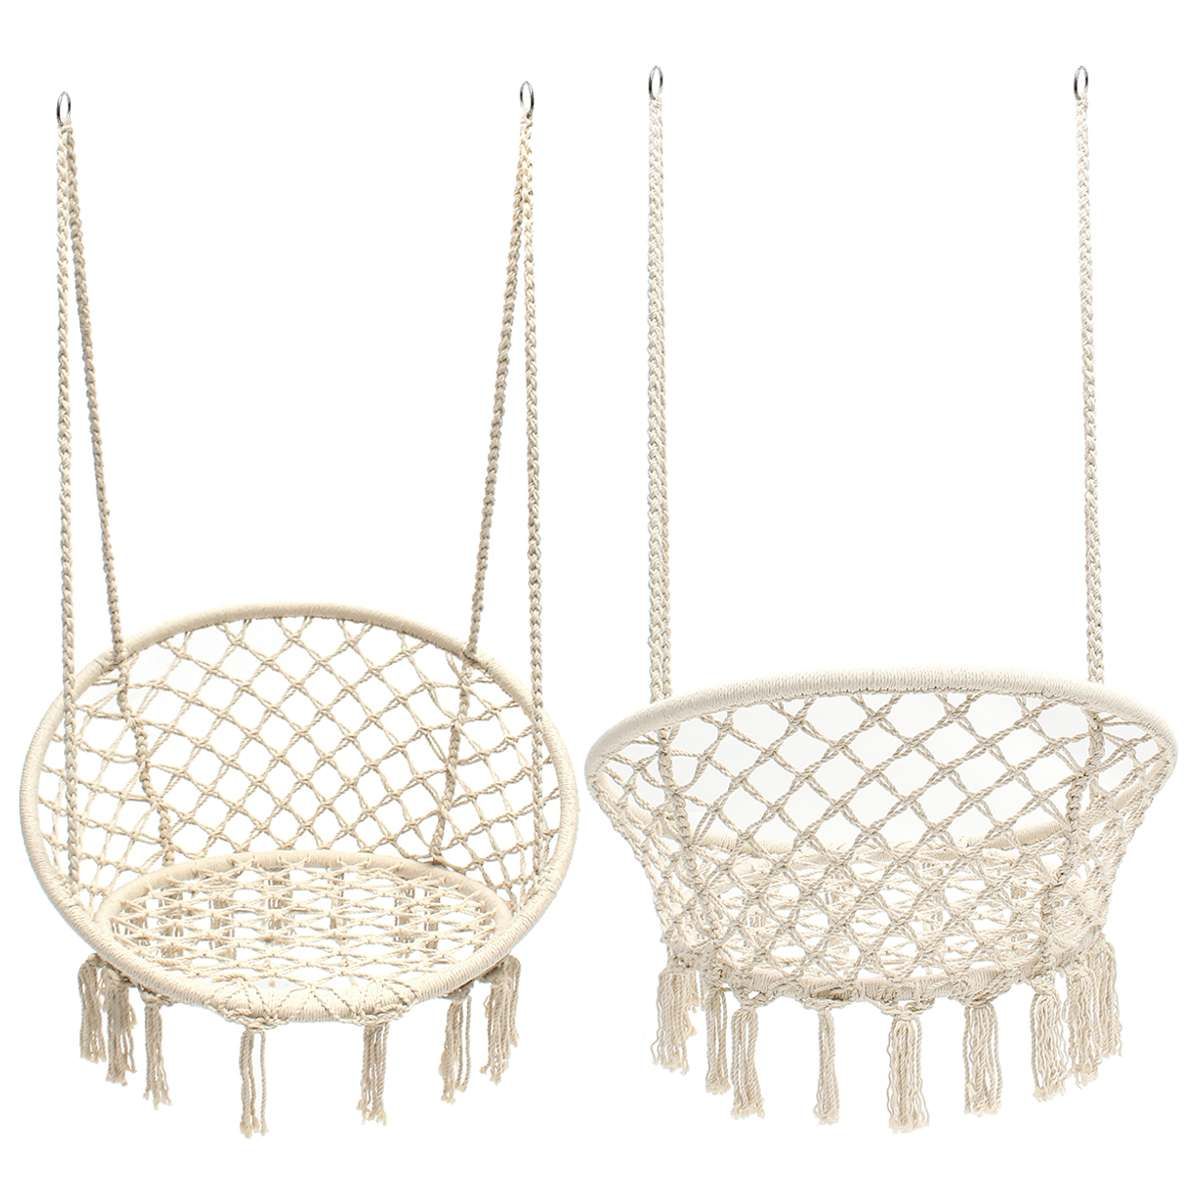 Hanging Hammock Chair Safe Swing Chair Hanging Kit Beige